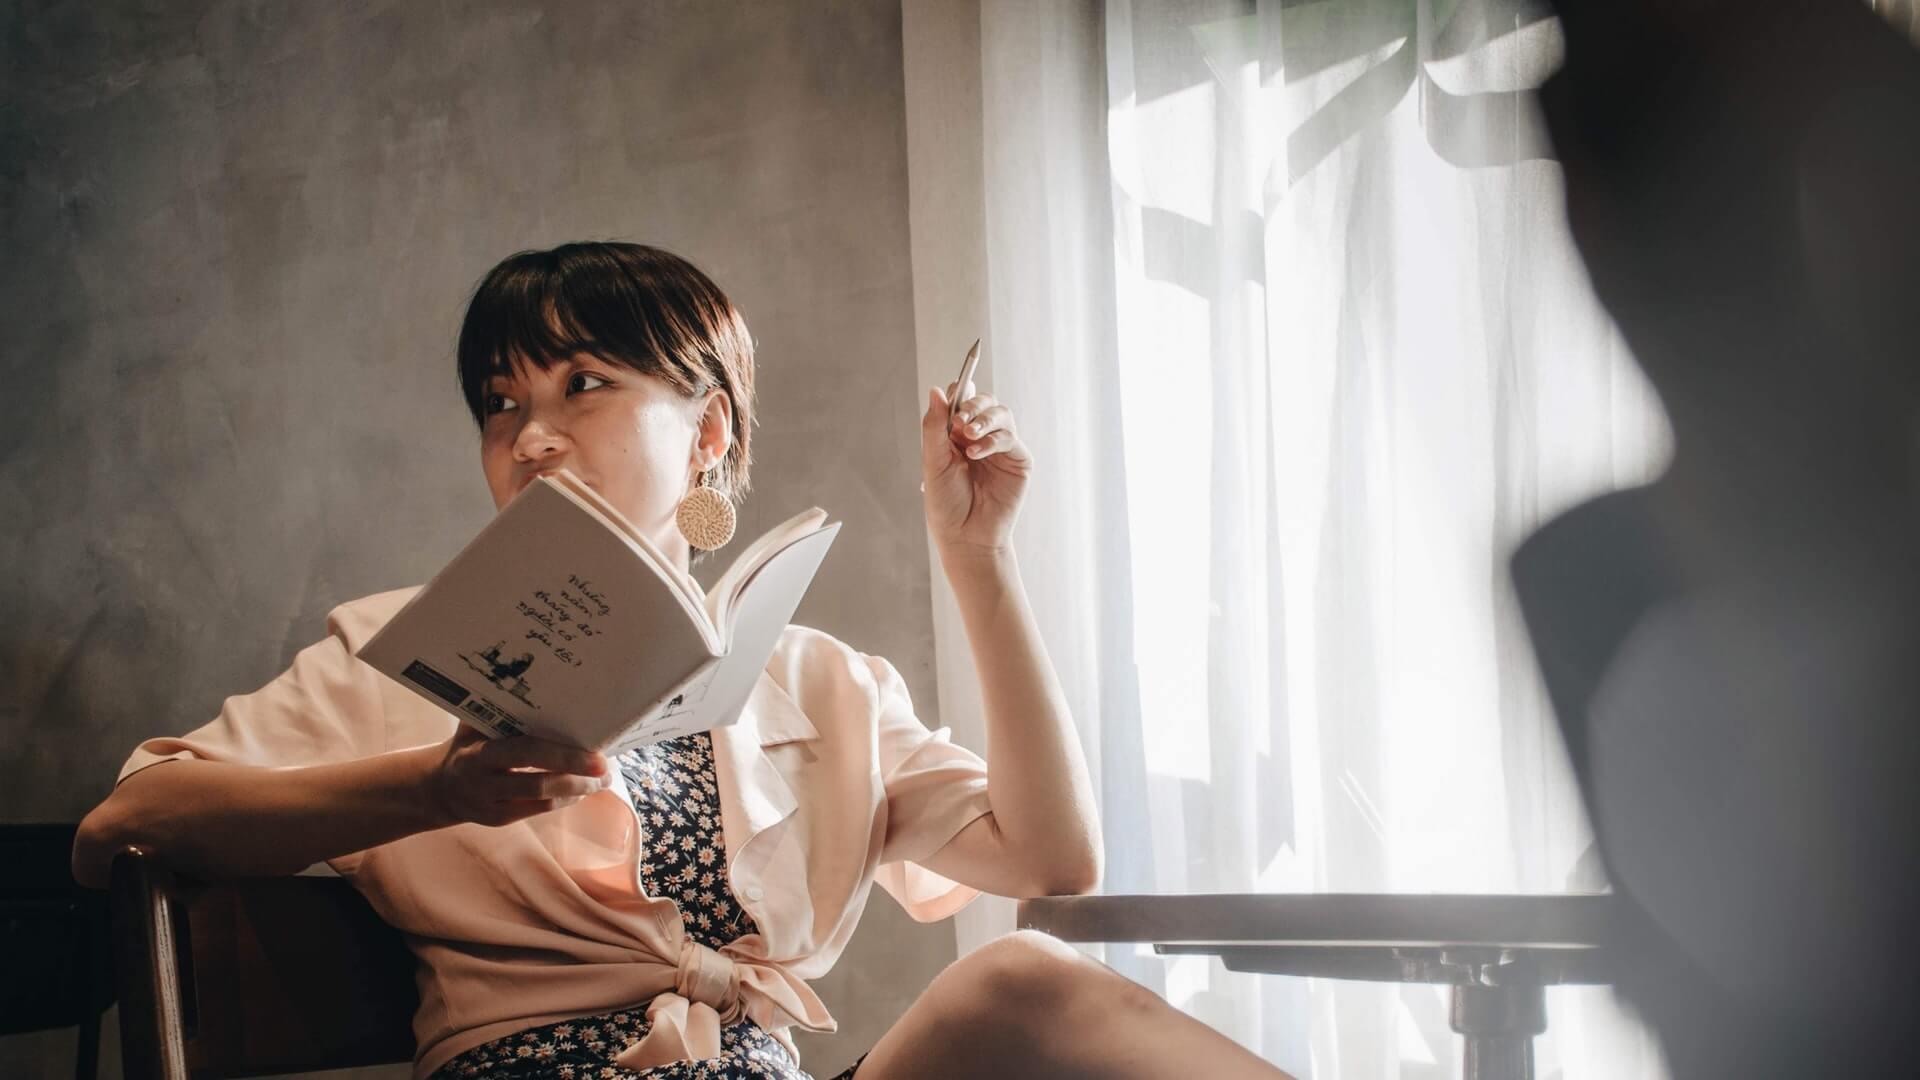 audiobook.jp月額会員プランと聴き放題プランの違い